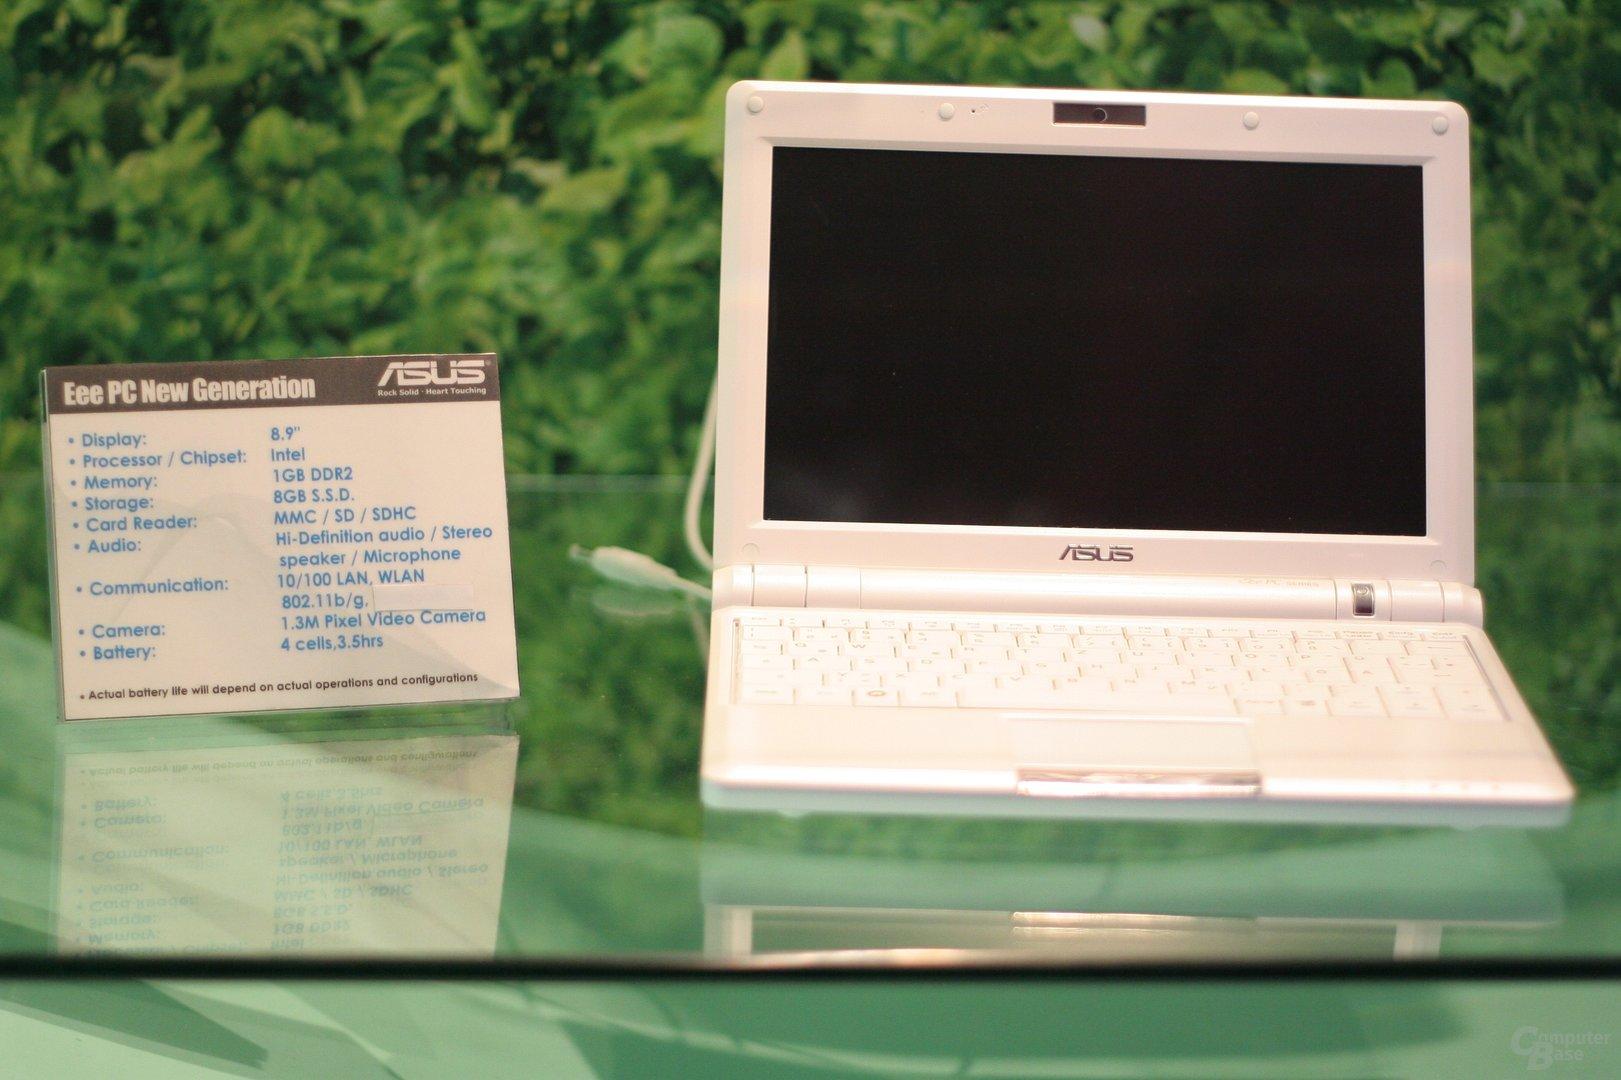 Asus Eee PC 900 mit 8,9-Zoll-Display